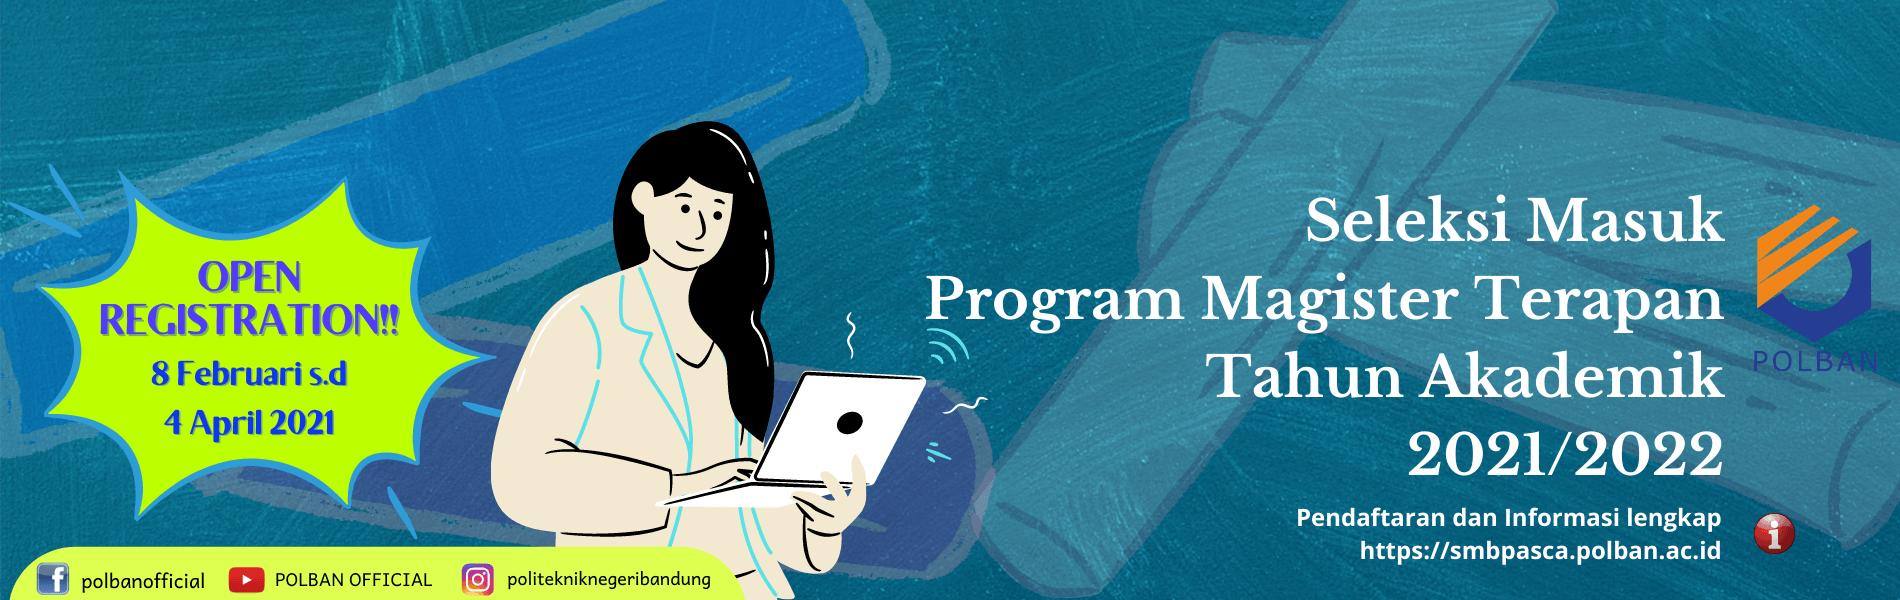 #SMBPasca2021 #ProgramMagisterTerapanPolban